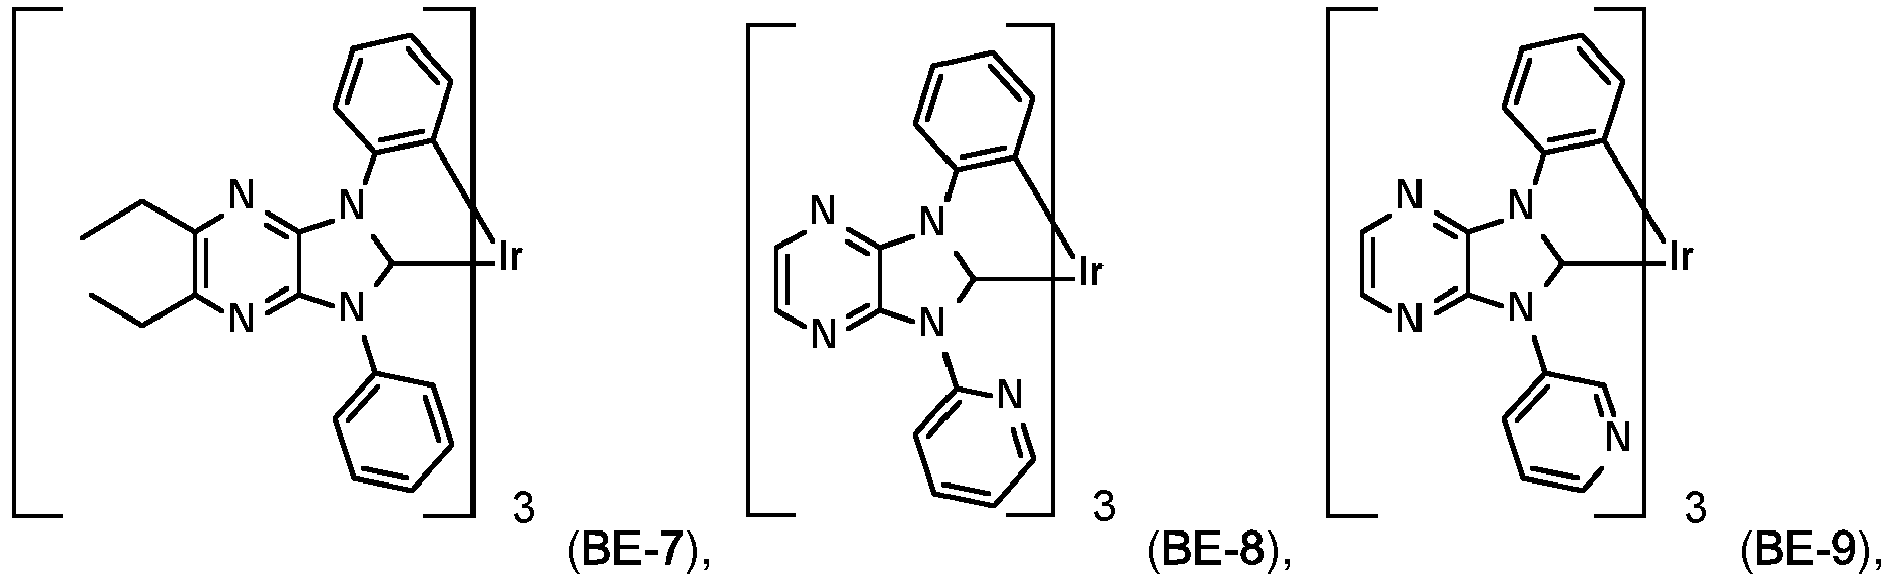 Figure imgb0754